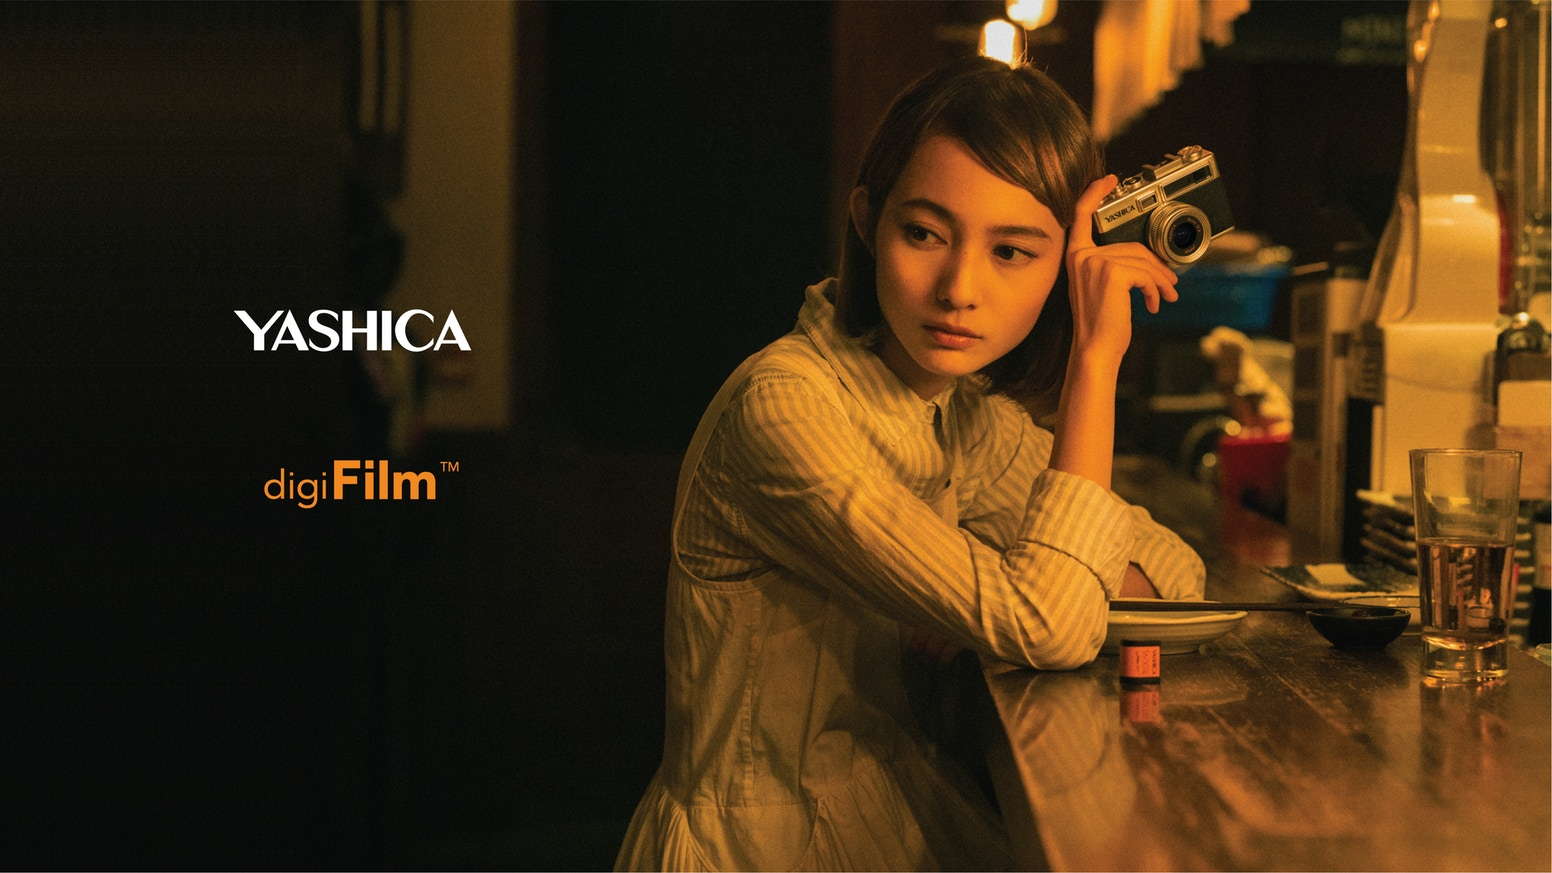 digifilm_yashica